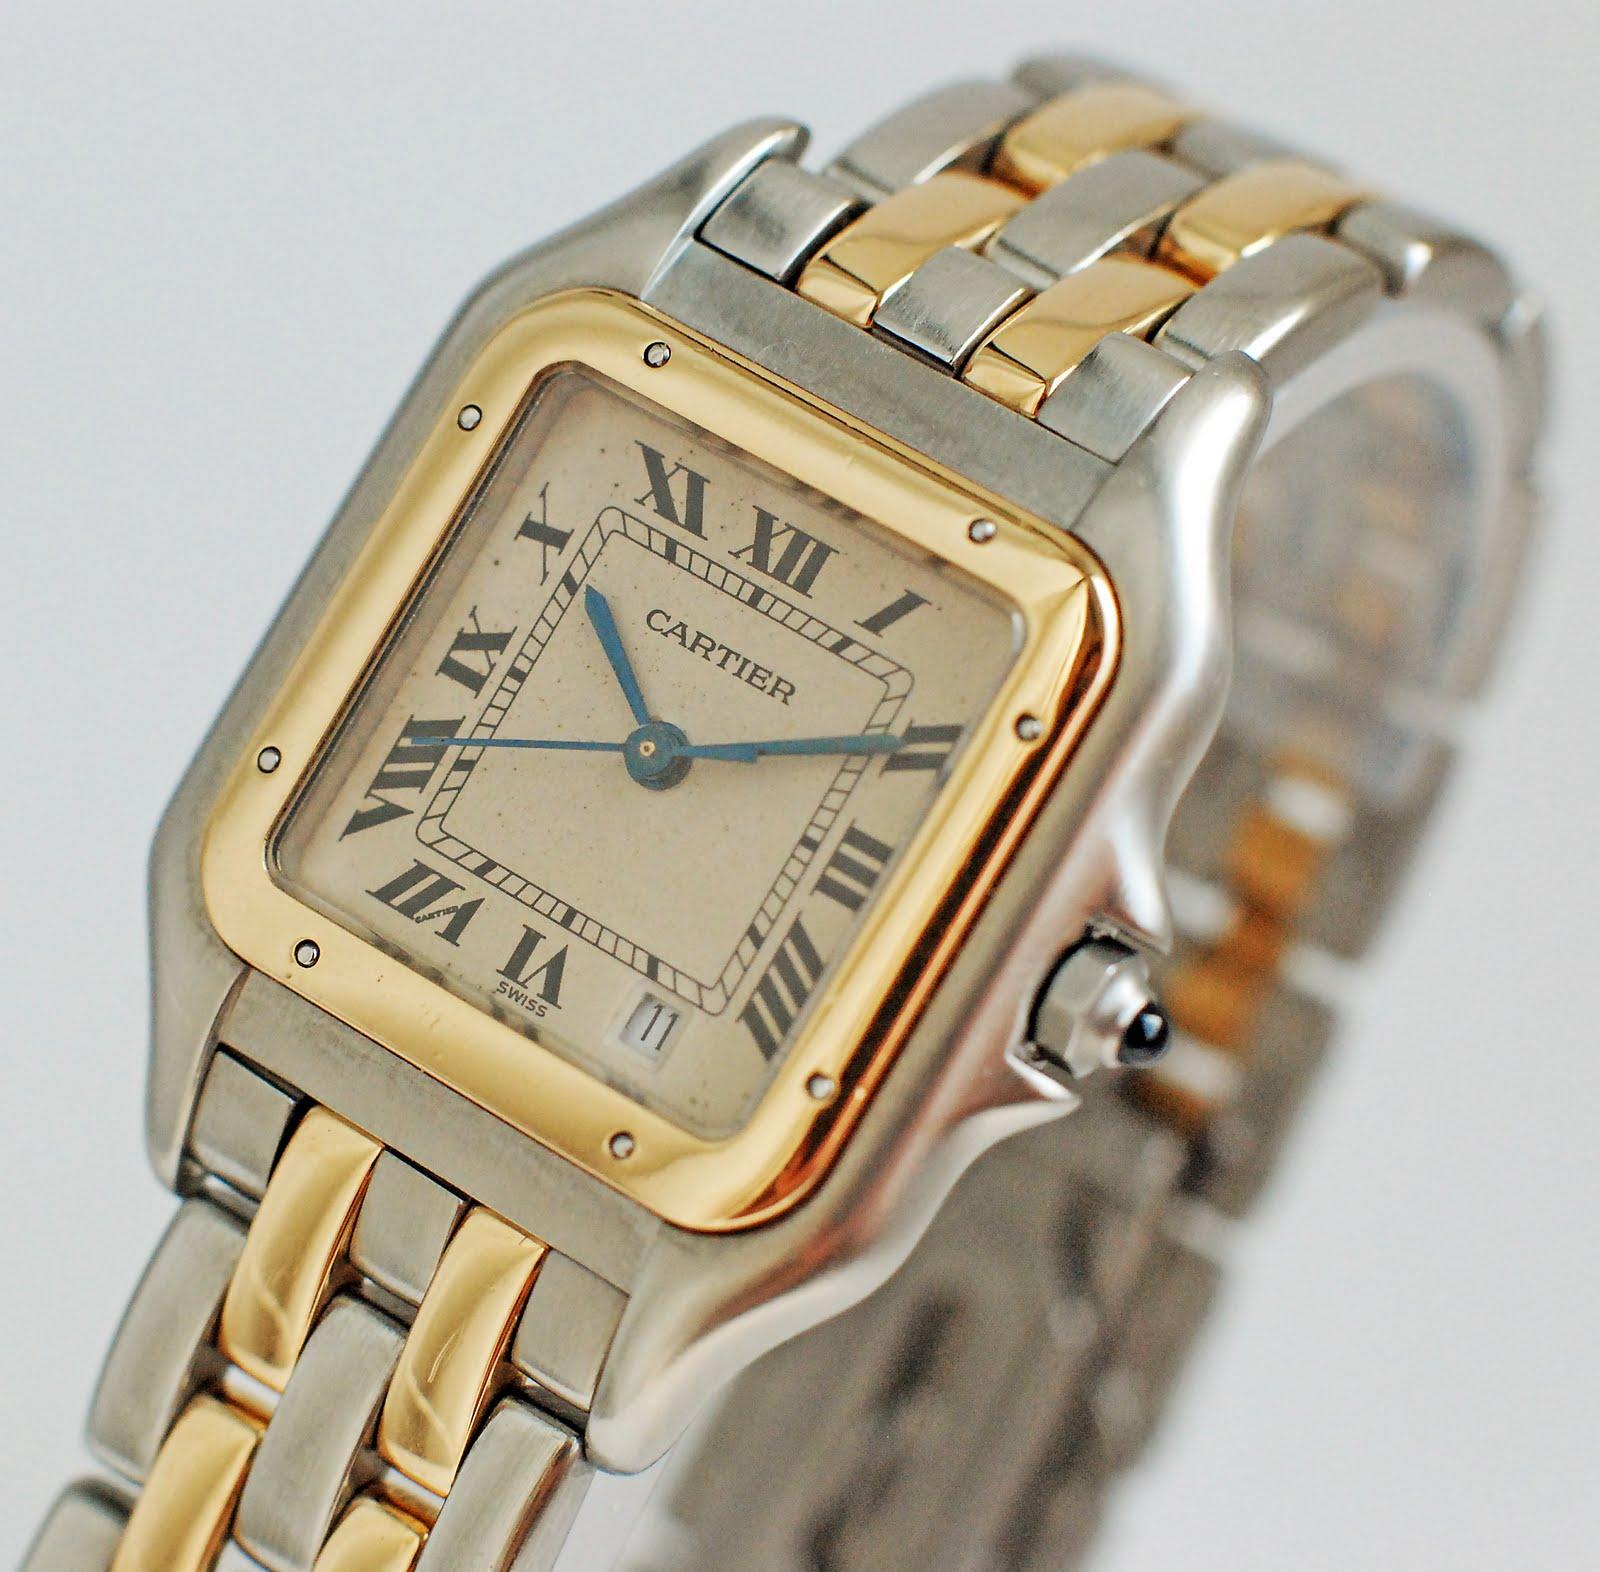 Uhren Ankauf Koln Goldgier Neueingang Cartier Panthere